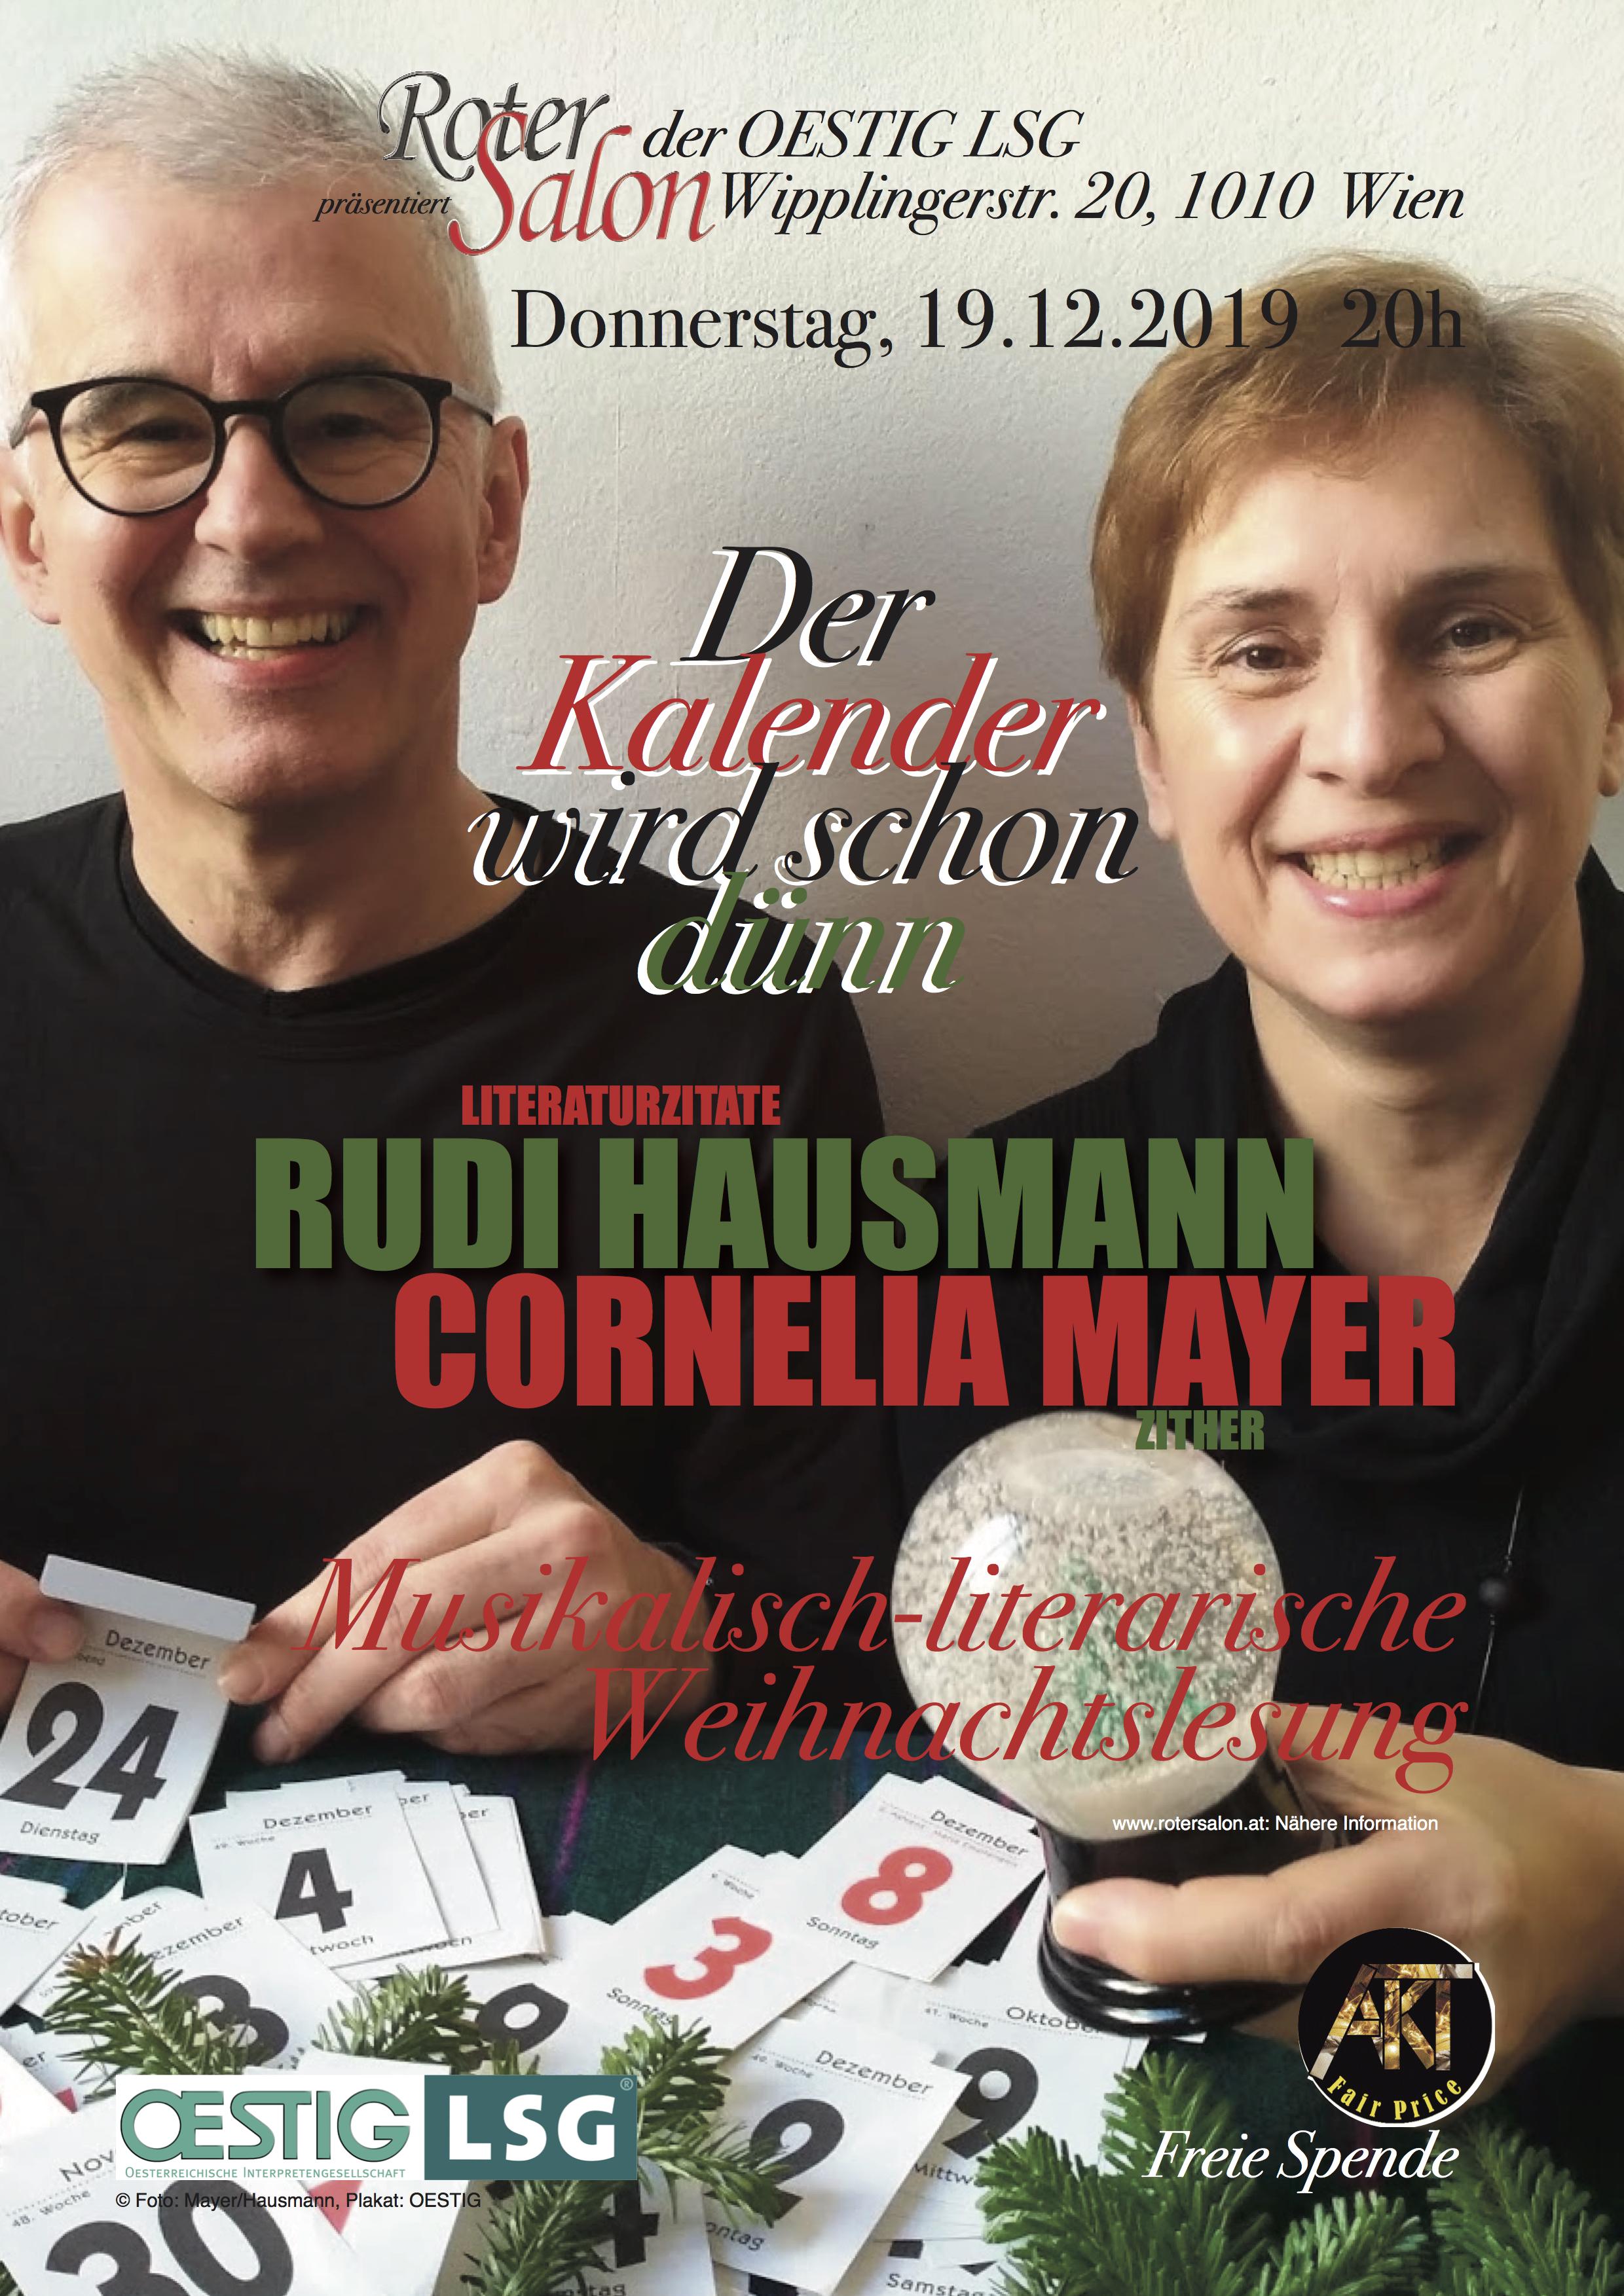 hausmann_mayer_zitherlesung2019